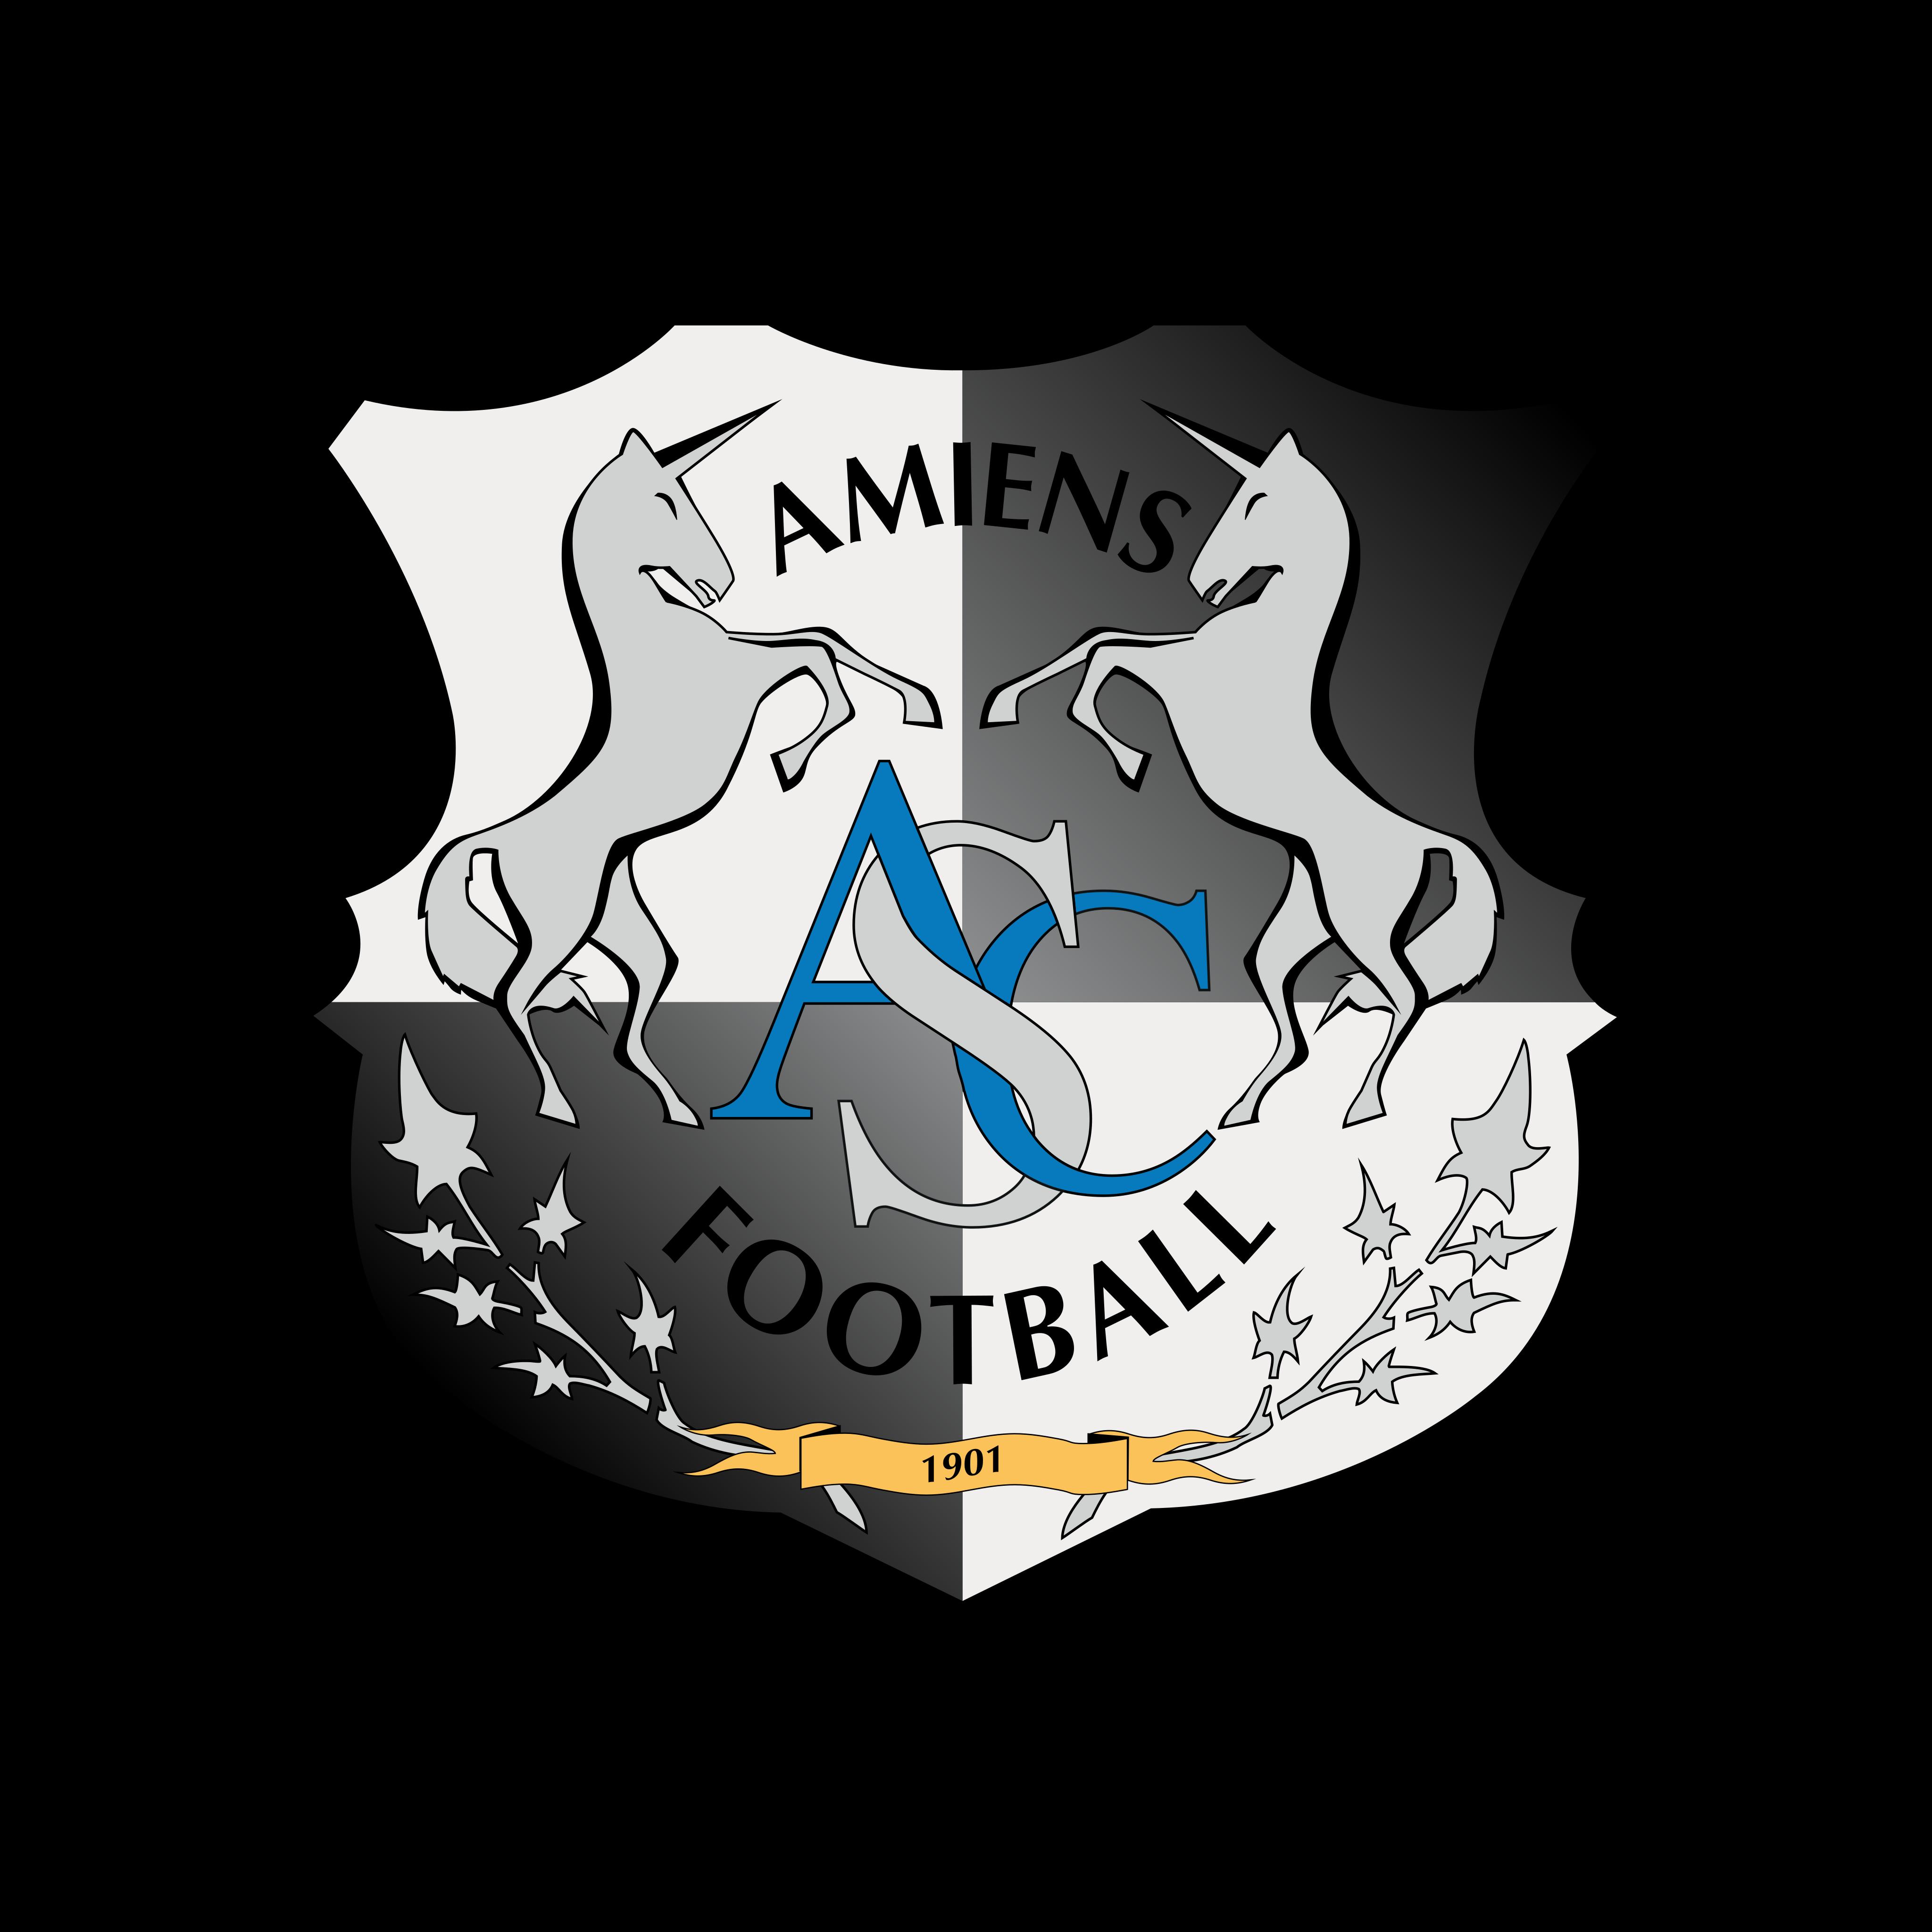 amiens sfc logo 0 - Amiens SCF Logo